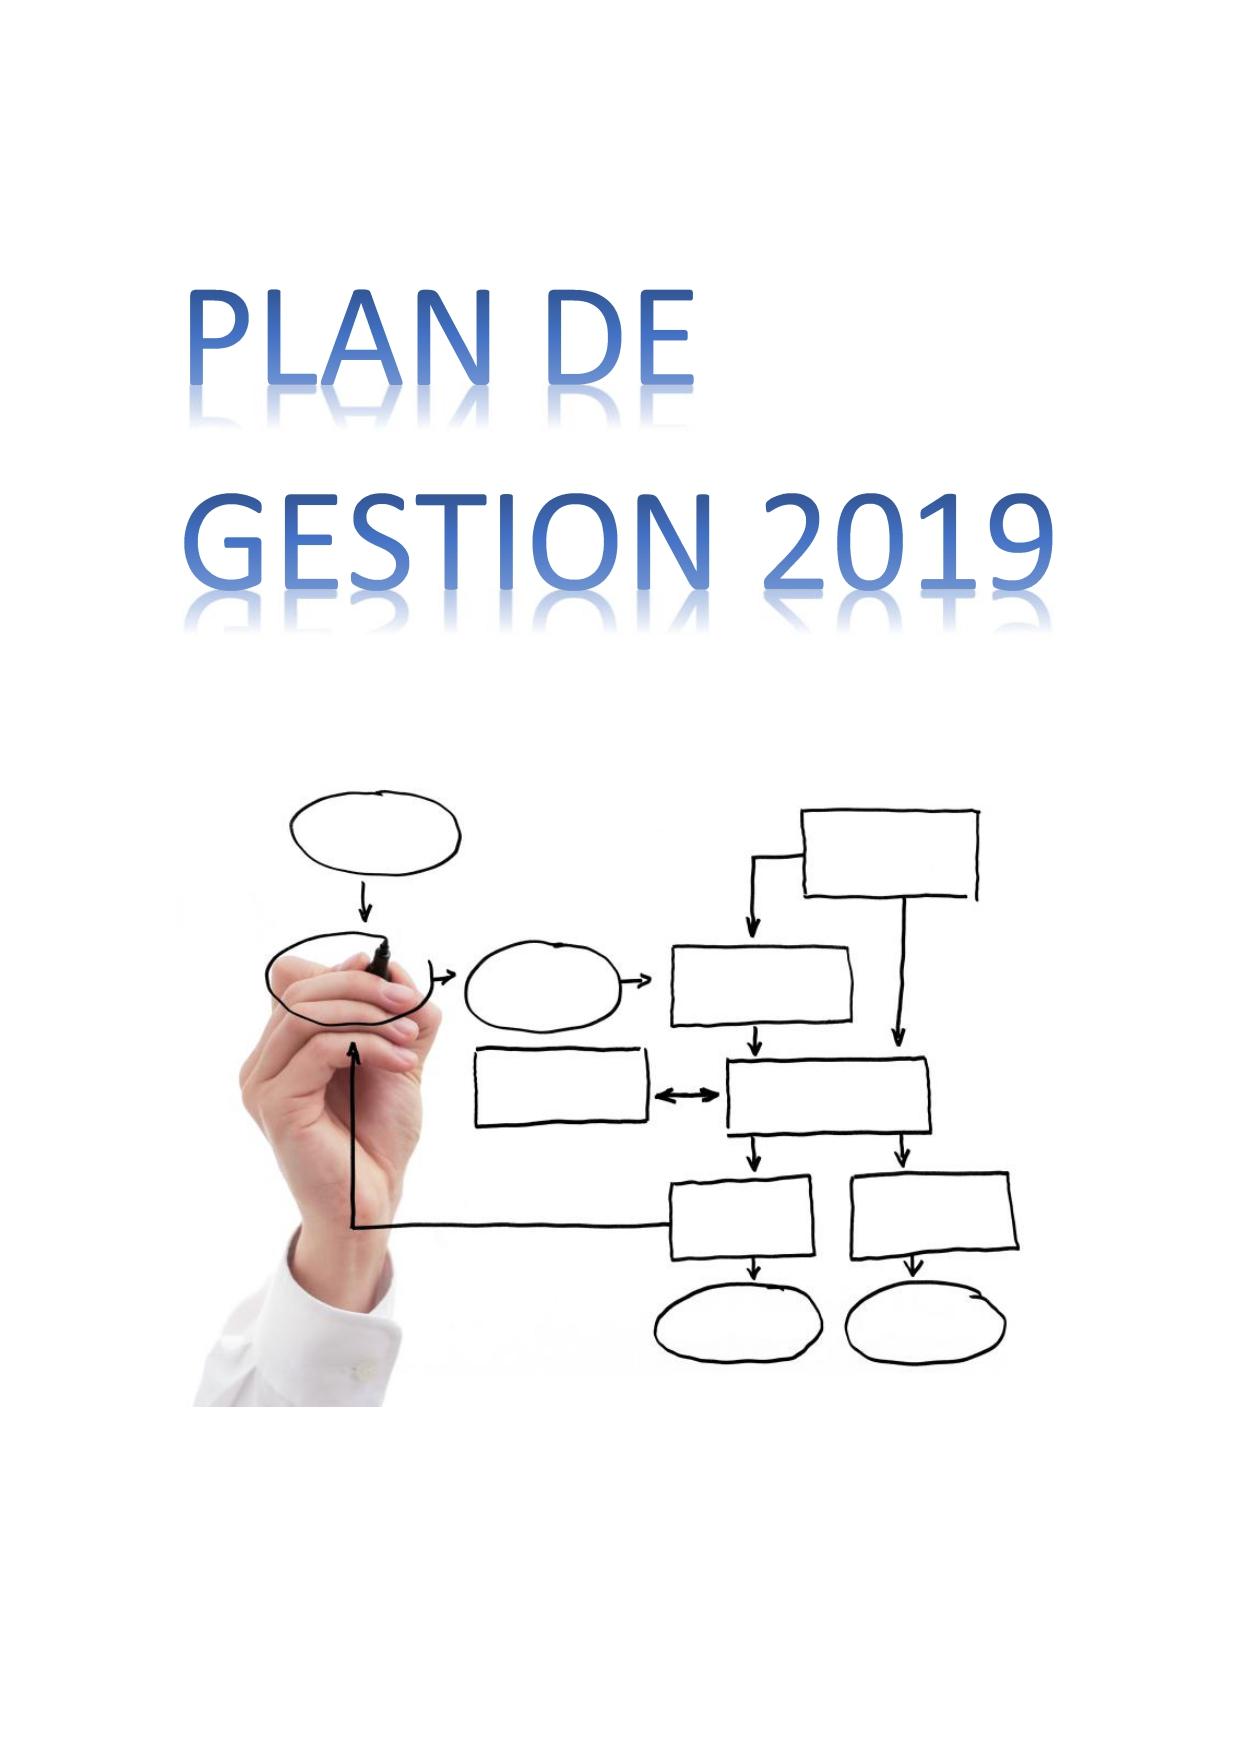 Plan-de-gestion-2019_page-0001